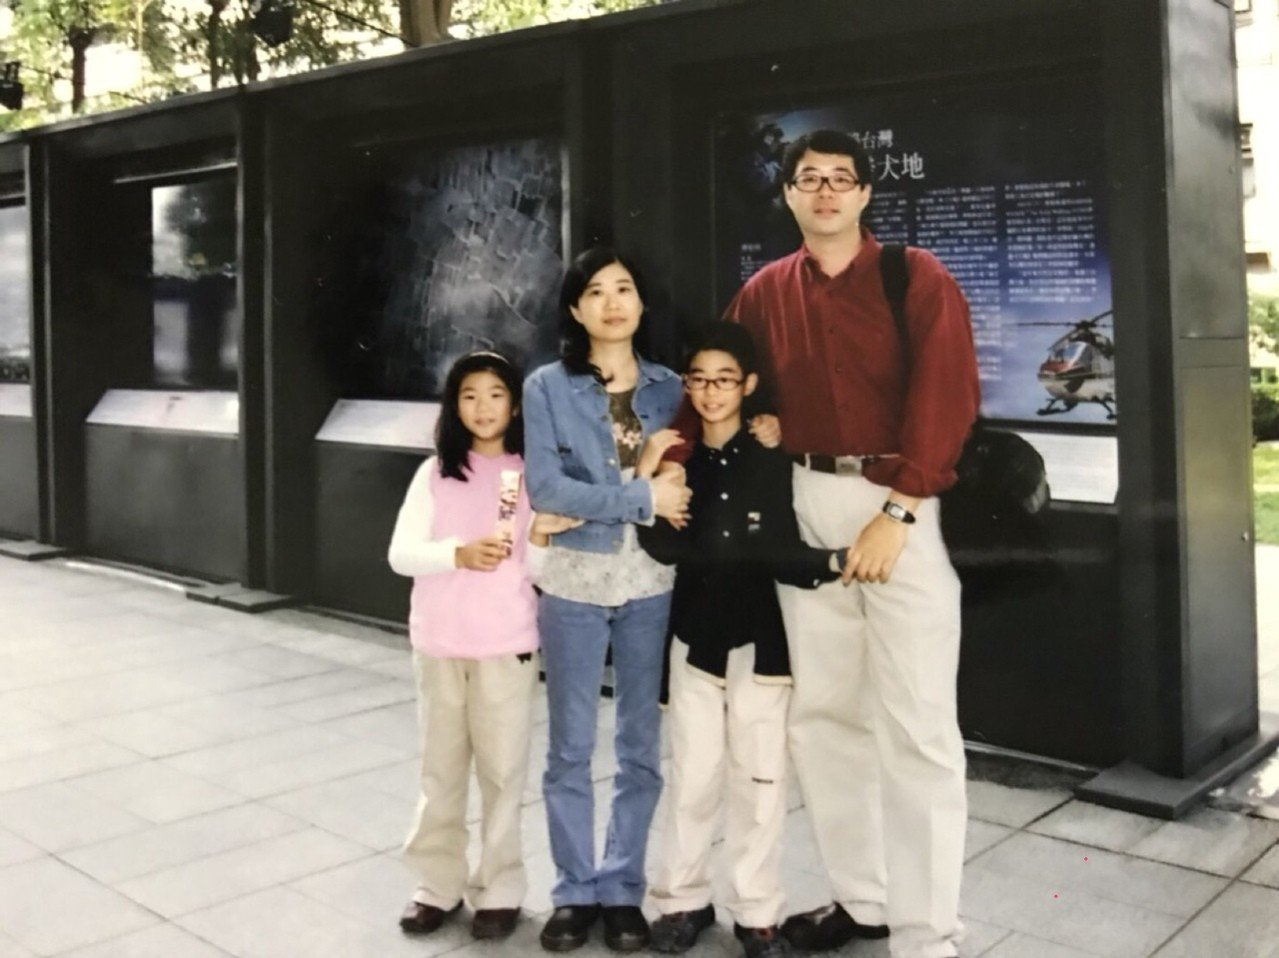 u故事 /齊柏林逝兩周年 兒:聞樓梯響 心還是痛